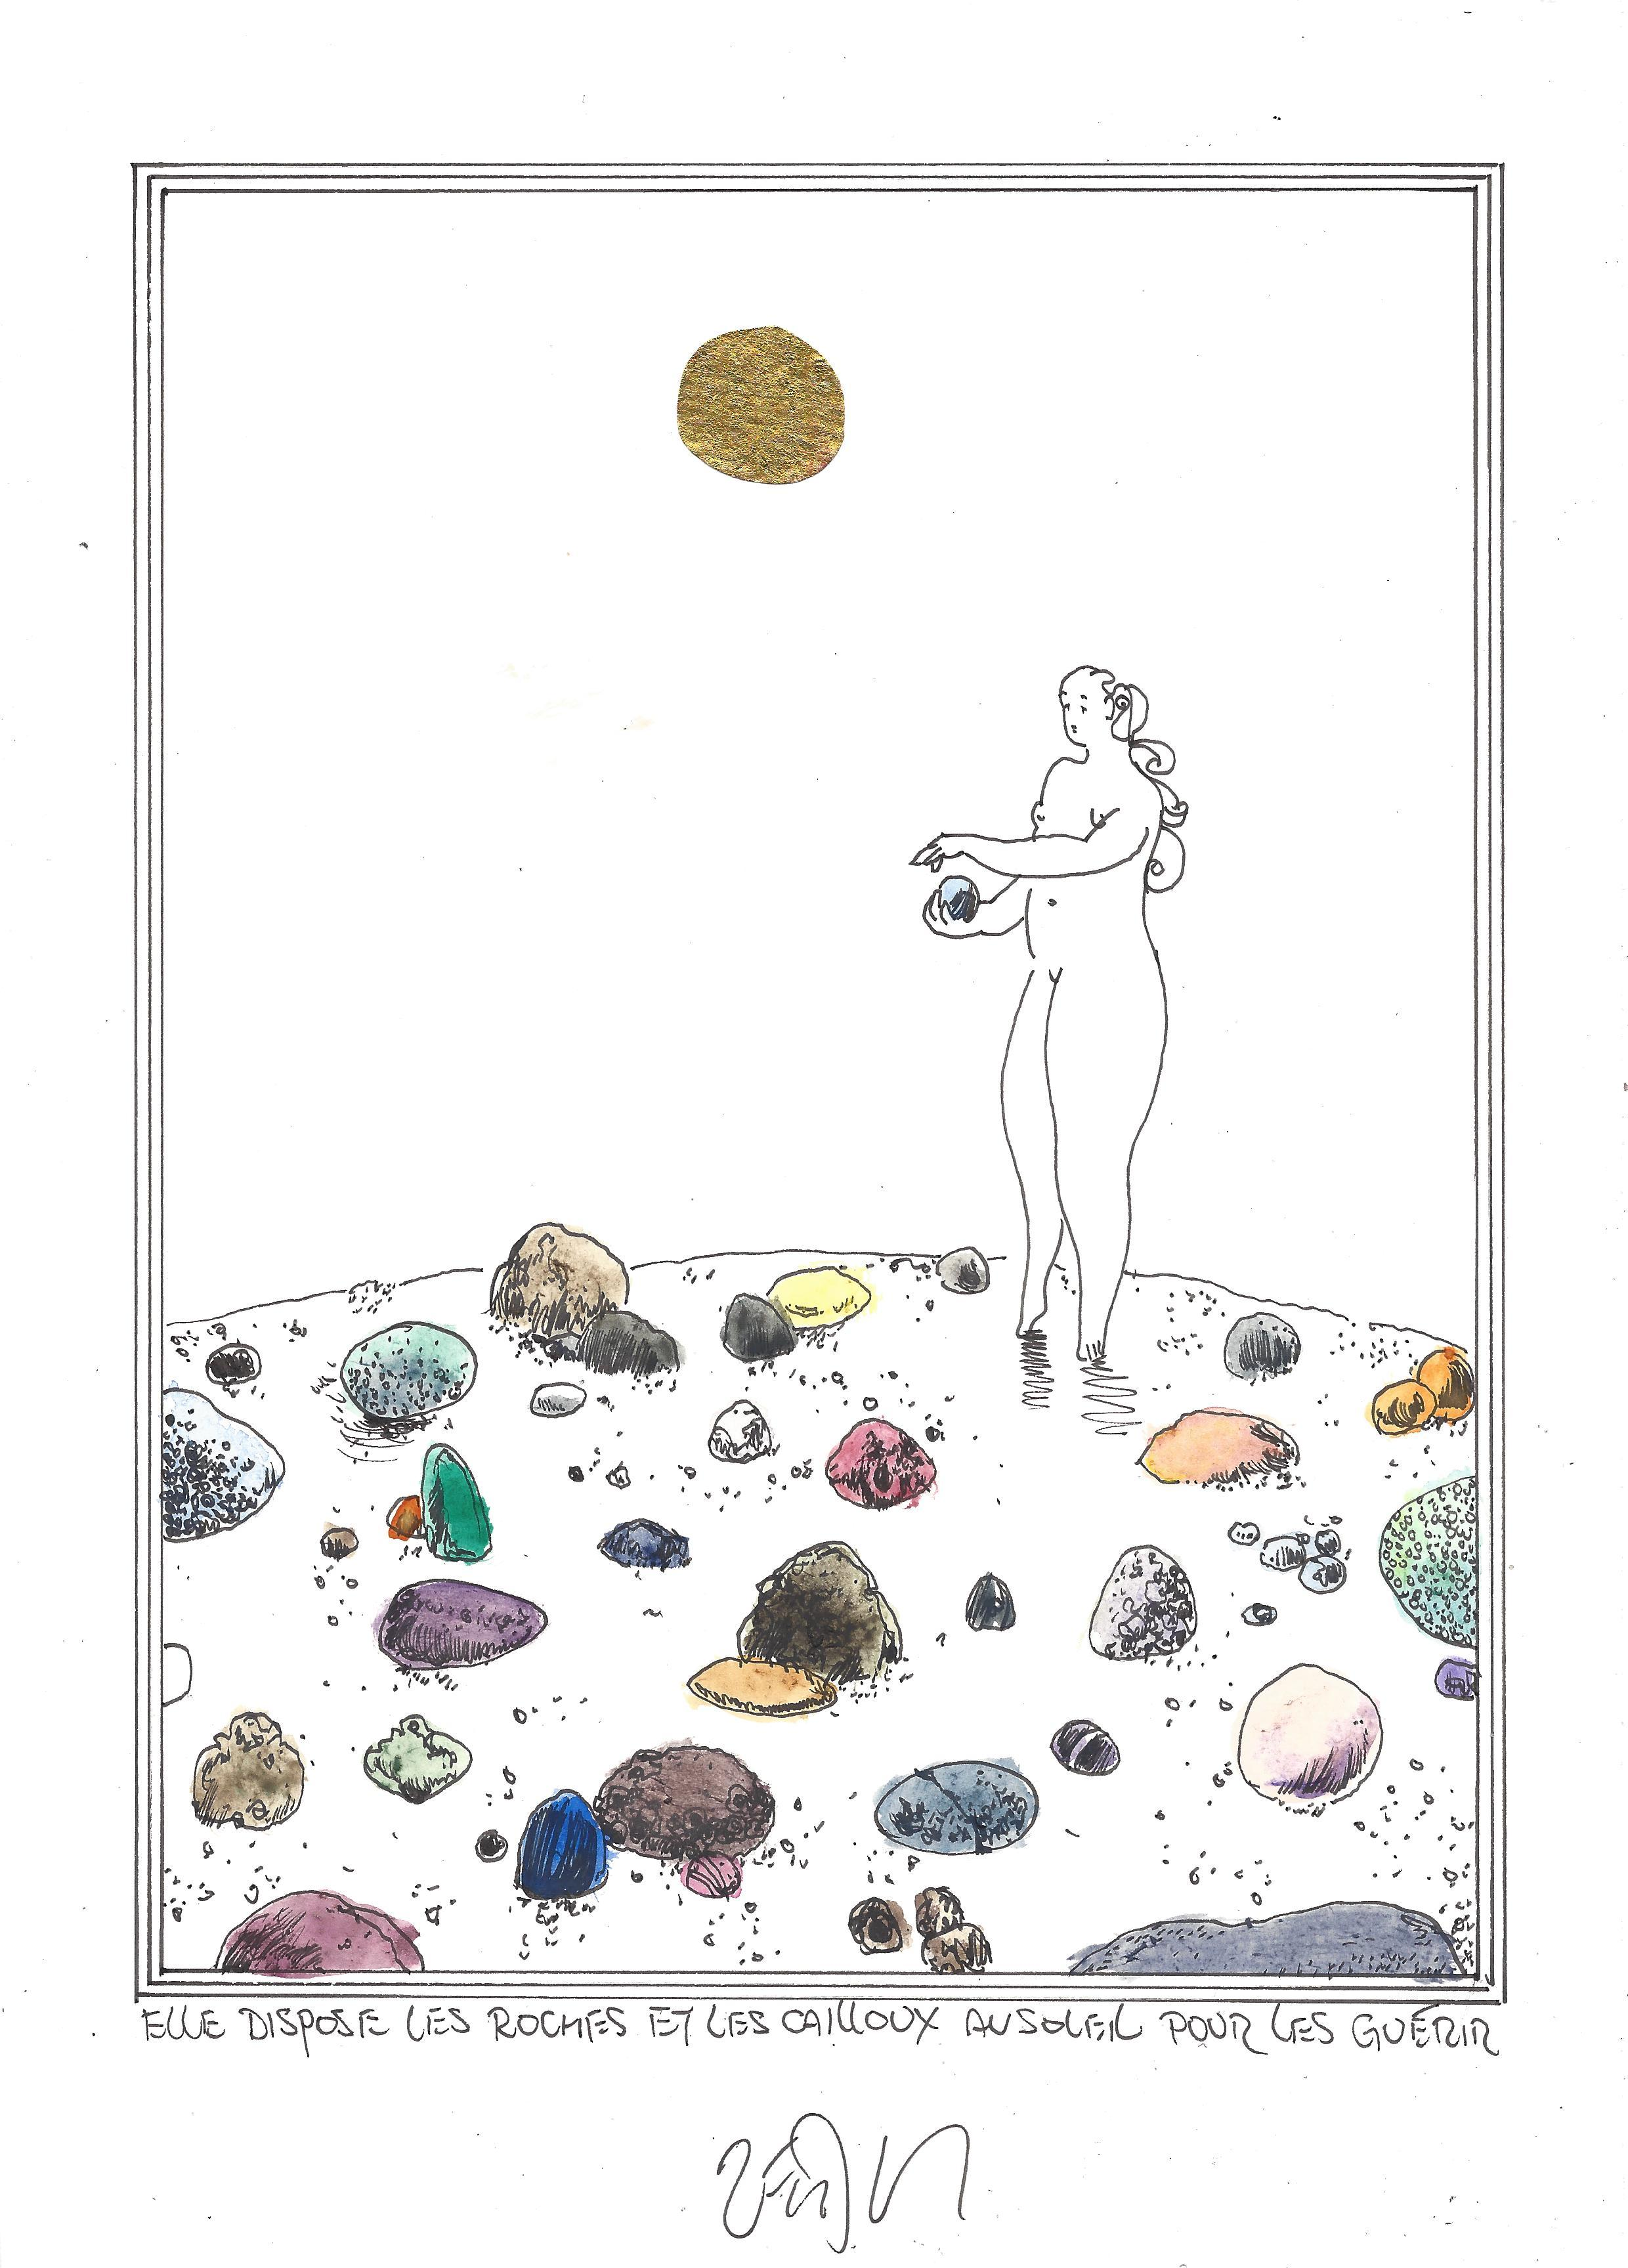 « Setting out rocks and stones in the sun to heal – Elle dispose les roches et les cailloux au soleil pour les guérir »